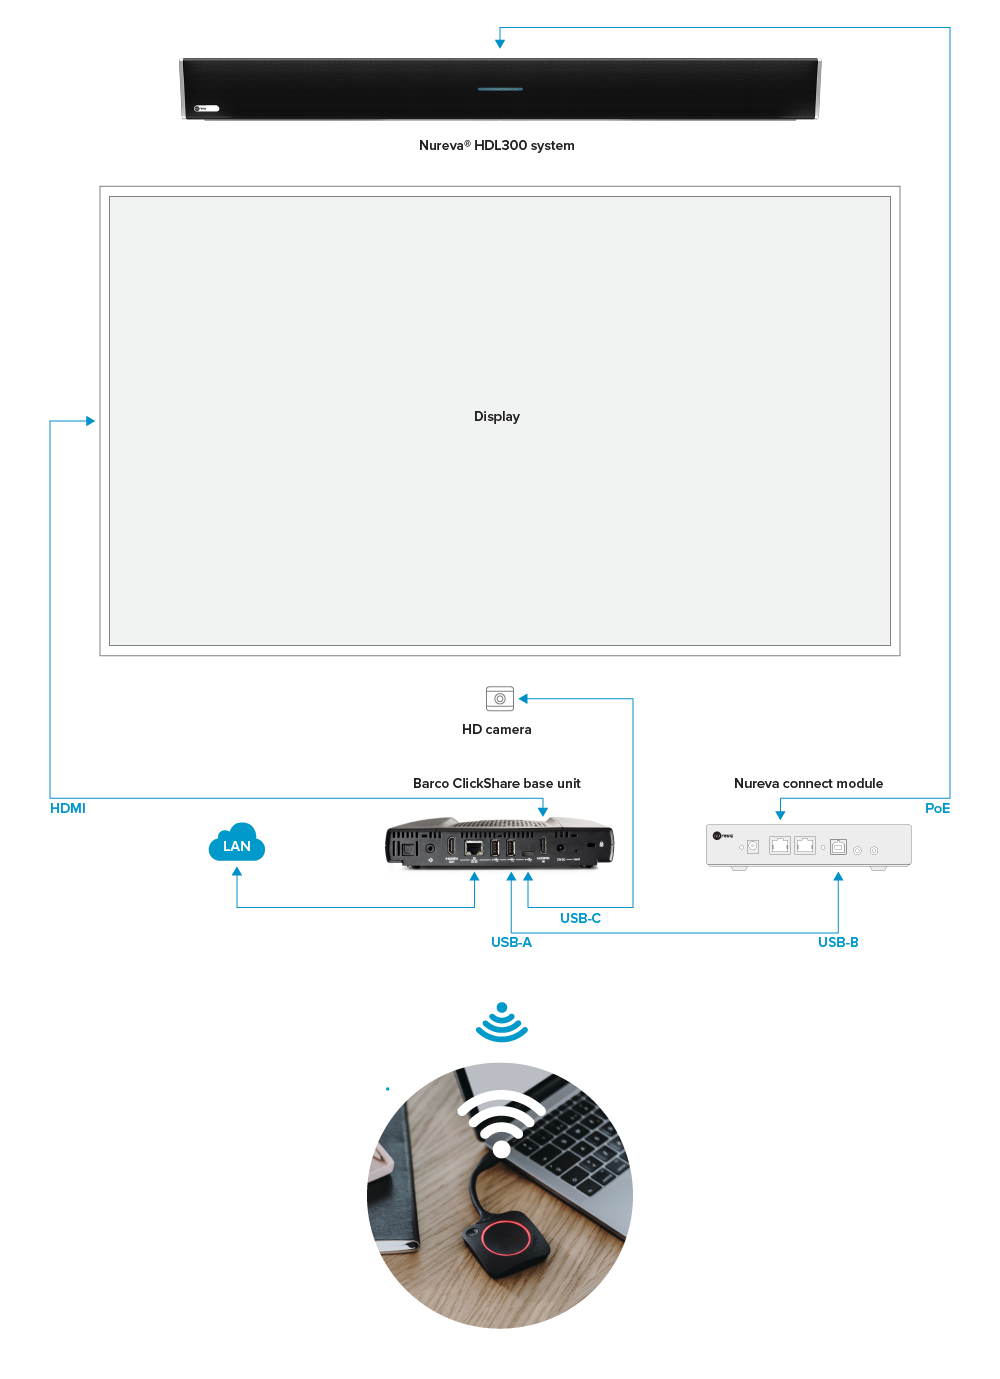 Nureva HDL300 and Barco ClickShare configuration diagram